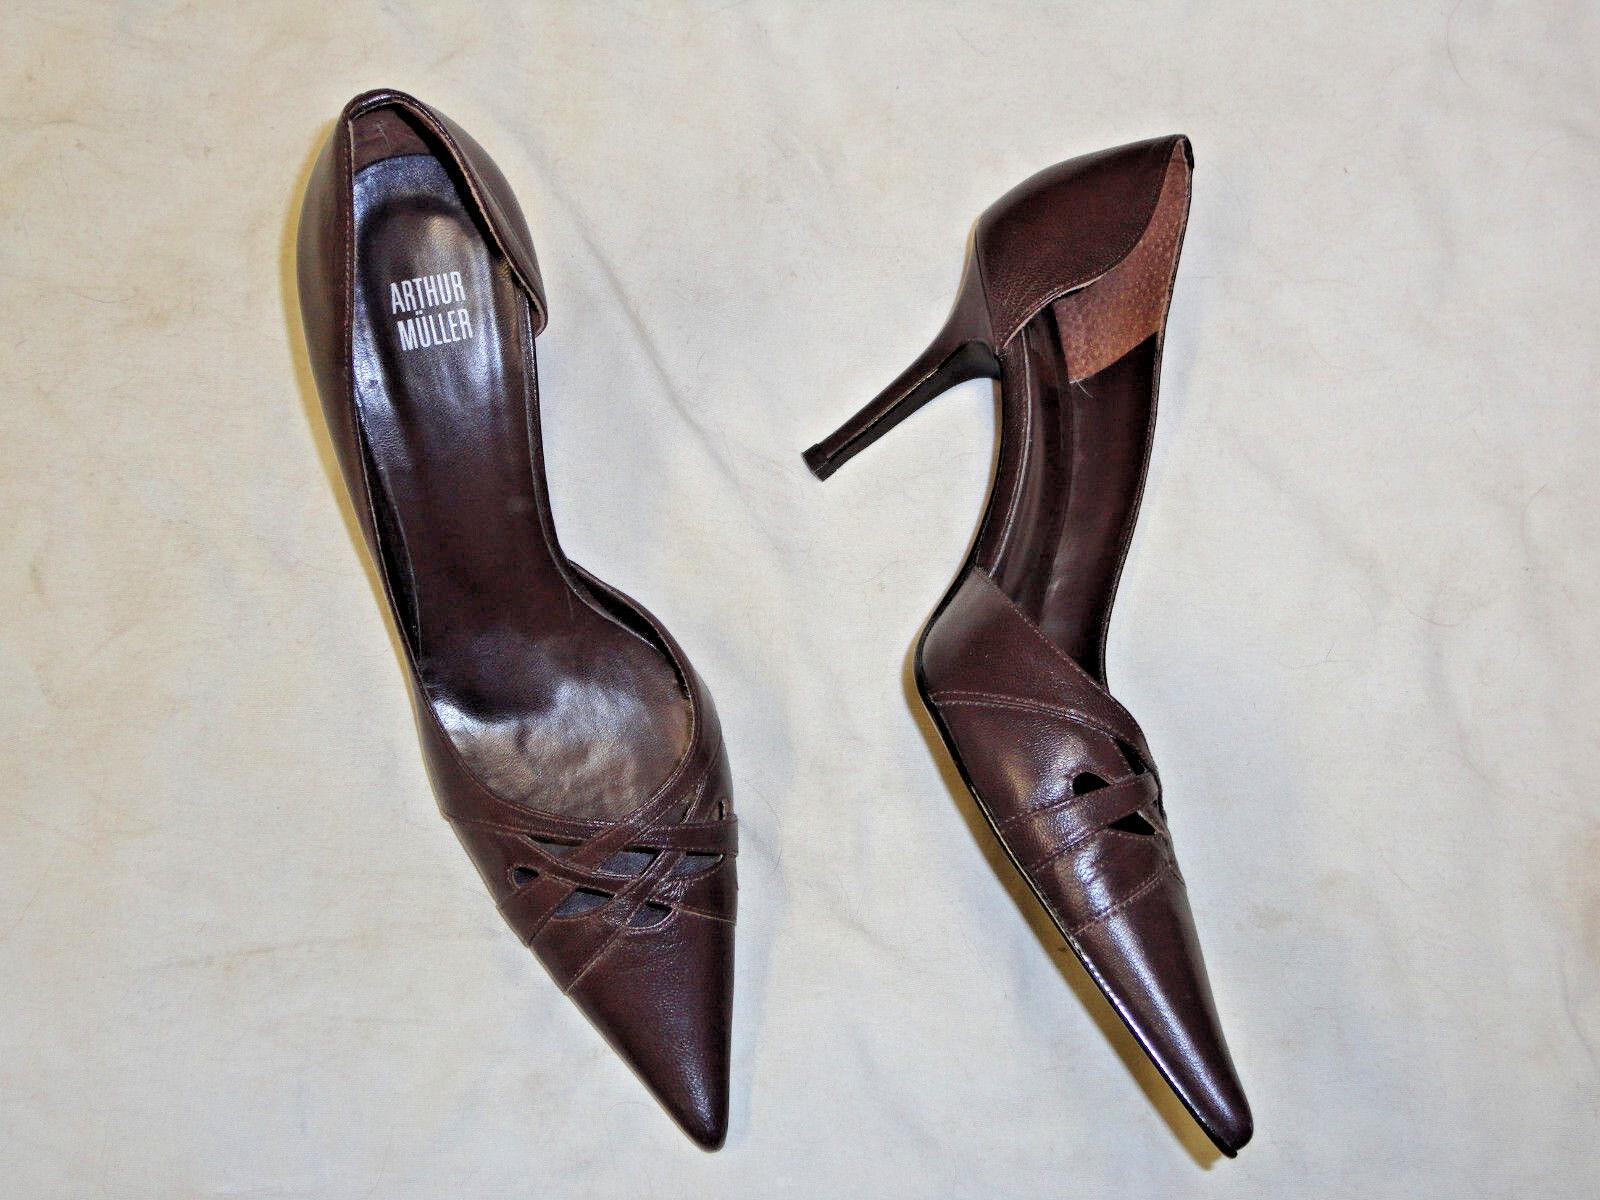 Arthur Muller heel  brown leather high heel Muller shoe   Size 9 0de2a8